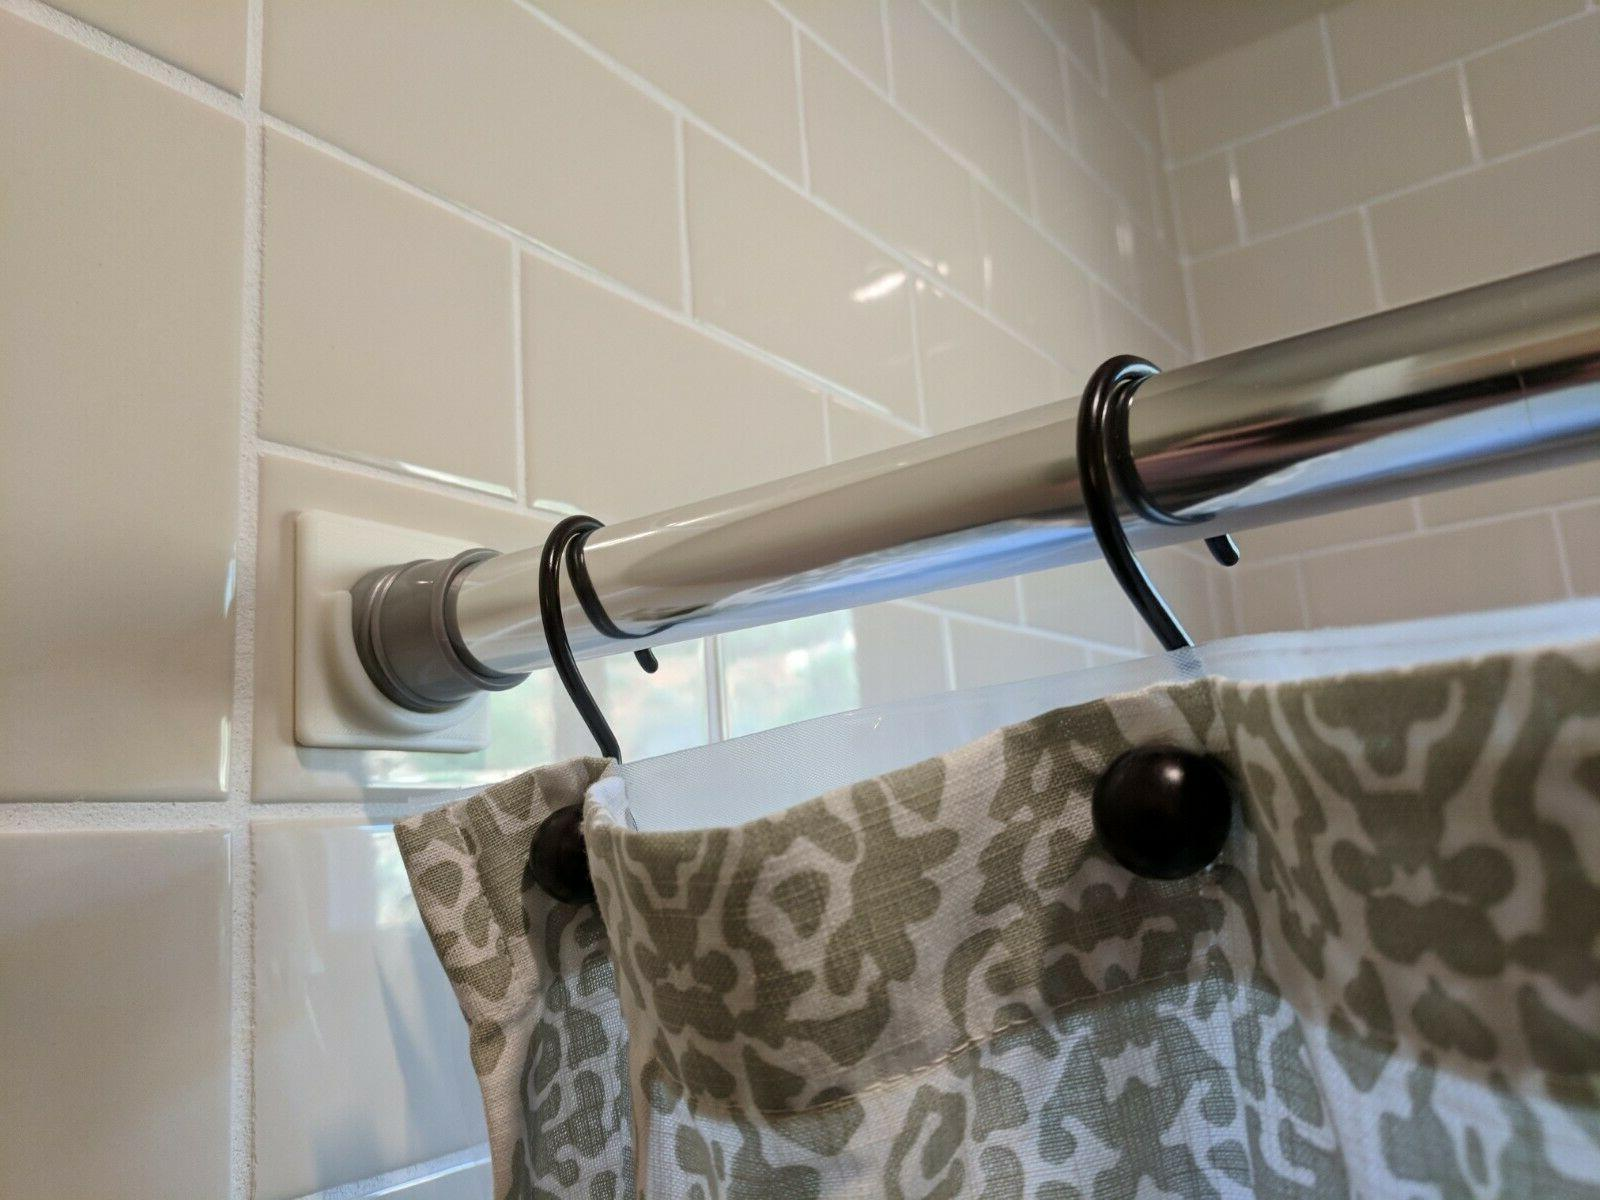 adhesive shower curtain rod holder no